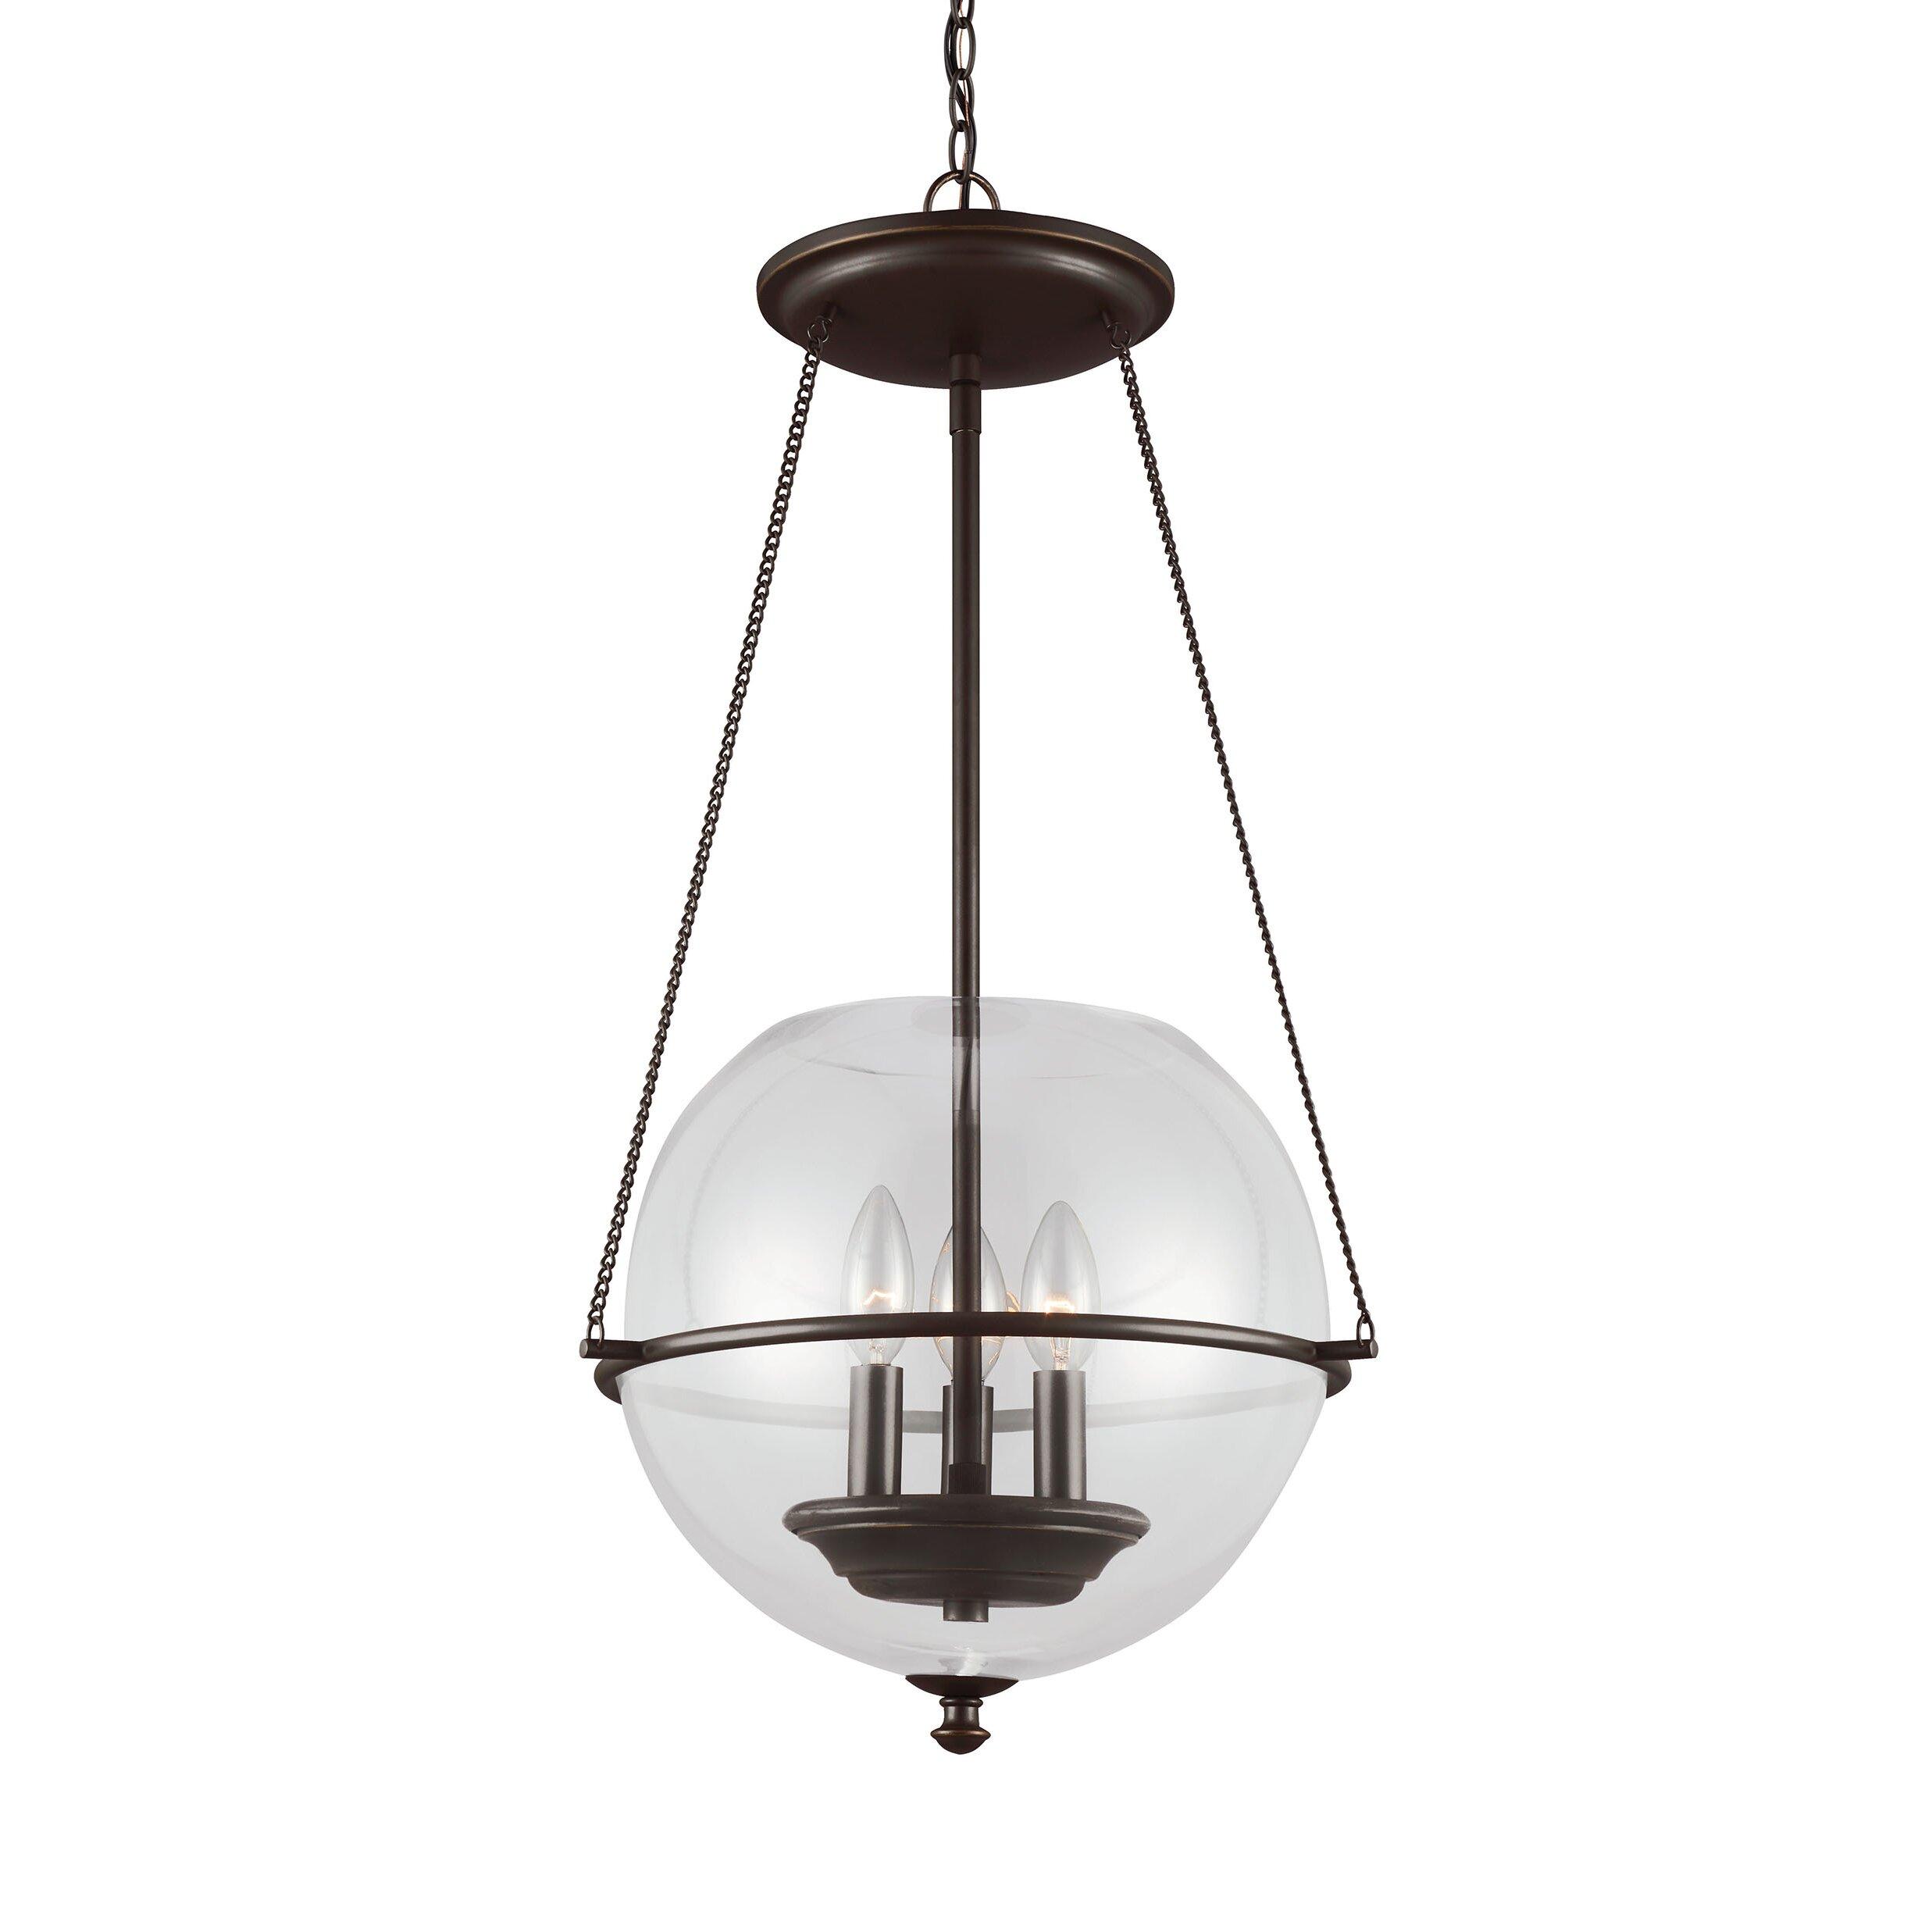 Sea Gull Lighting Havenwood 3 Light Globe Pendant